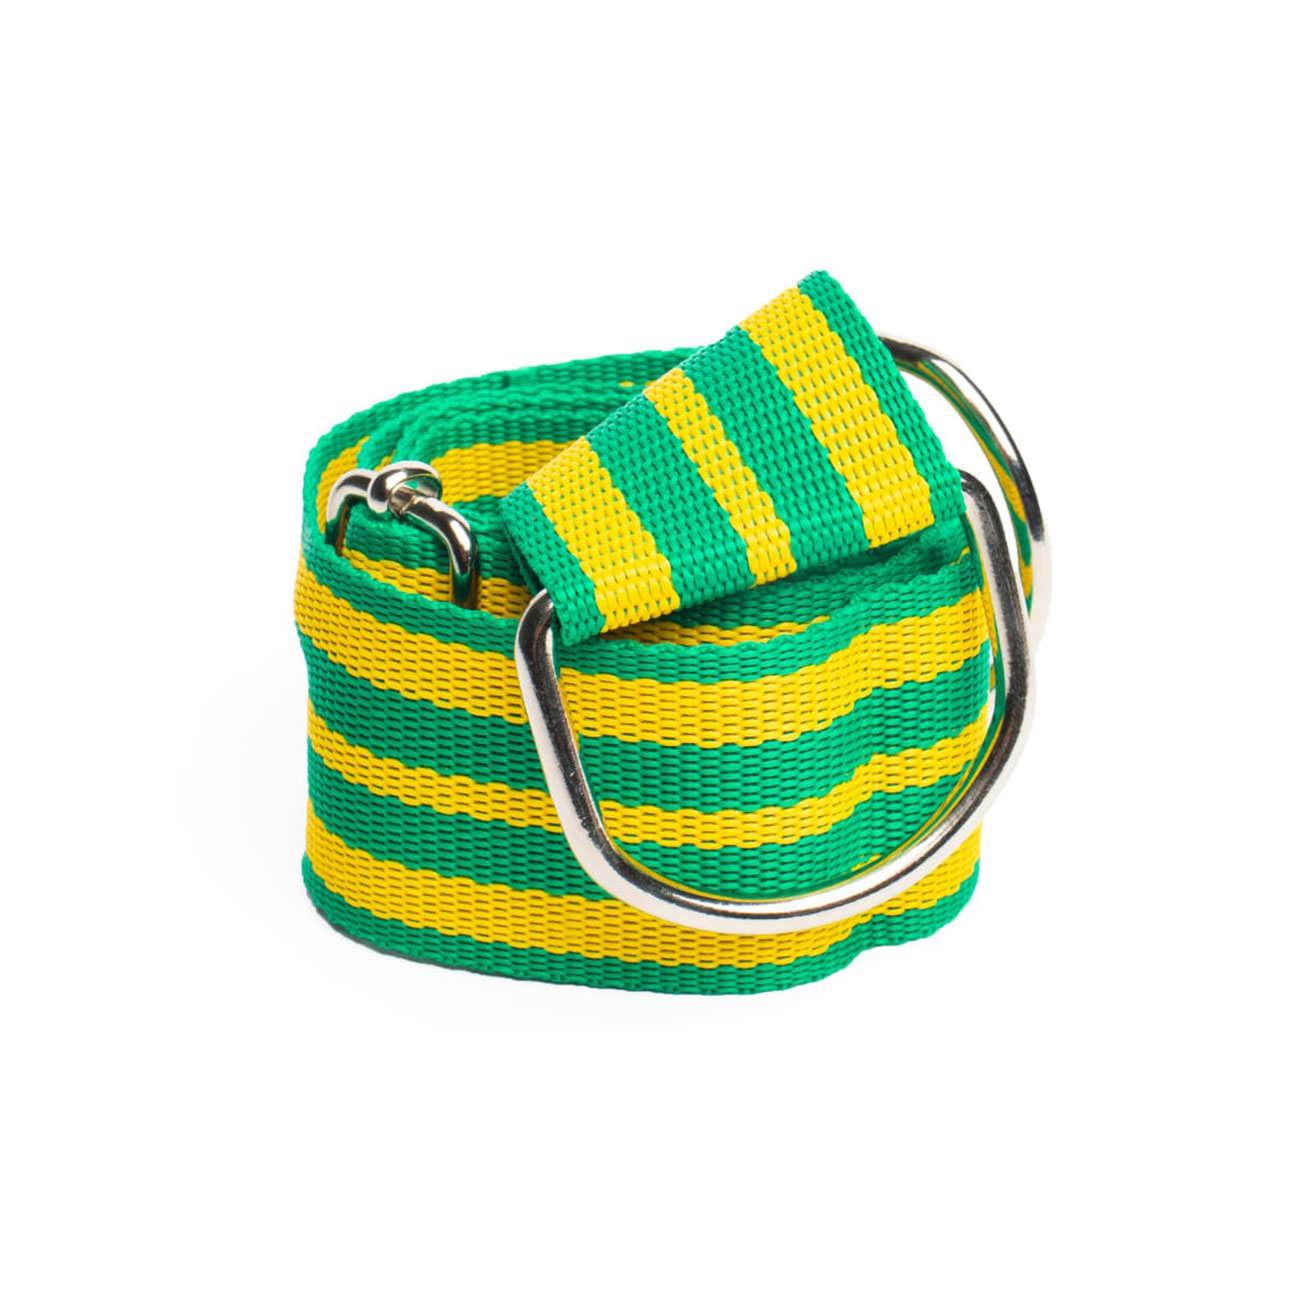 zeleno-žltý / green & yellow